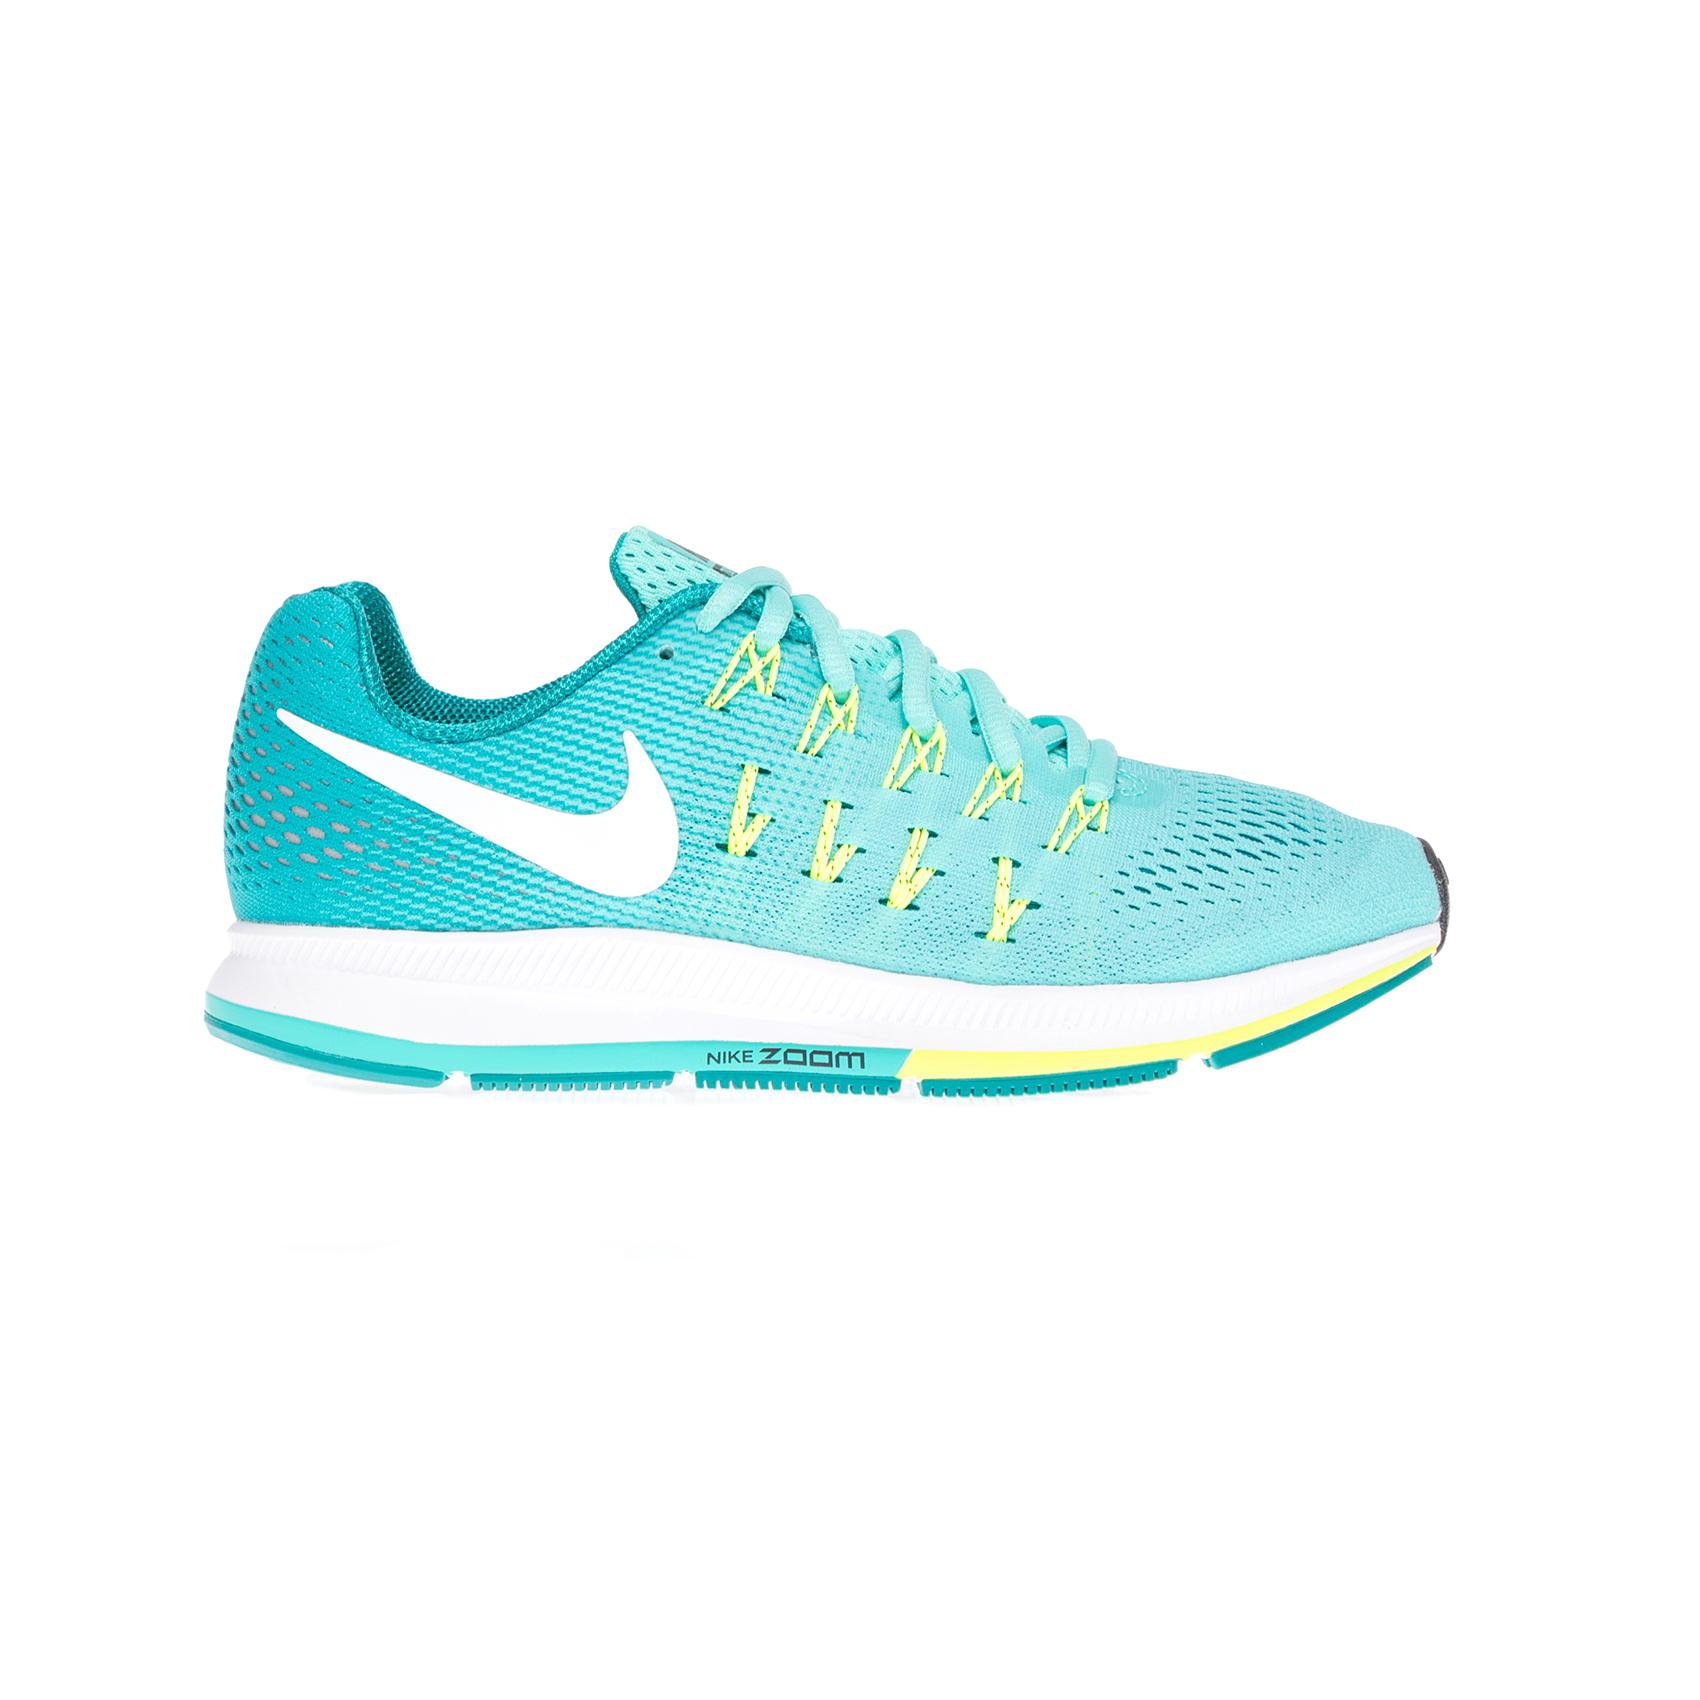 1d9889b948ad NIKE – Γυναικεία αθλητικά παπούτσια NIKE AIR ZOOM PEGASUS 33 μπλε